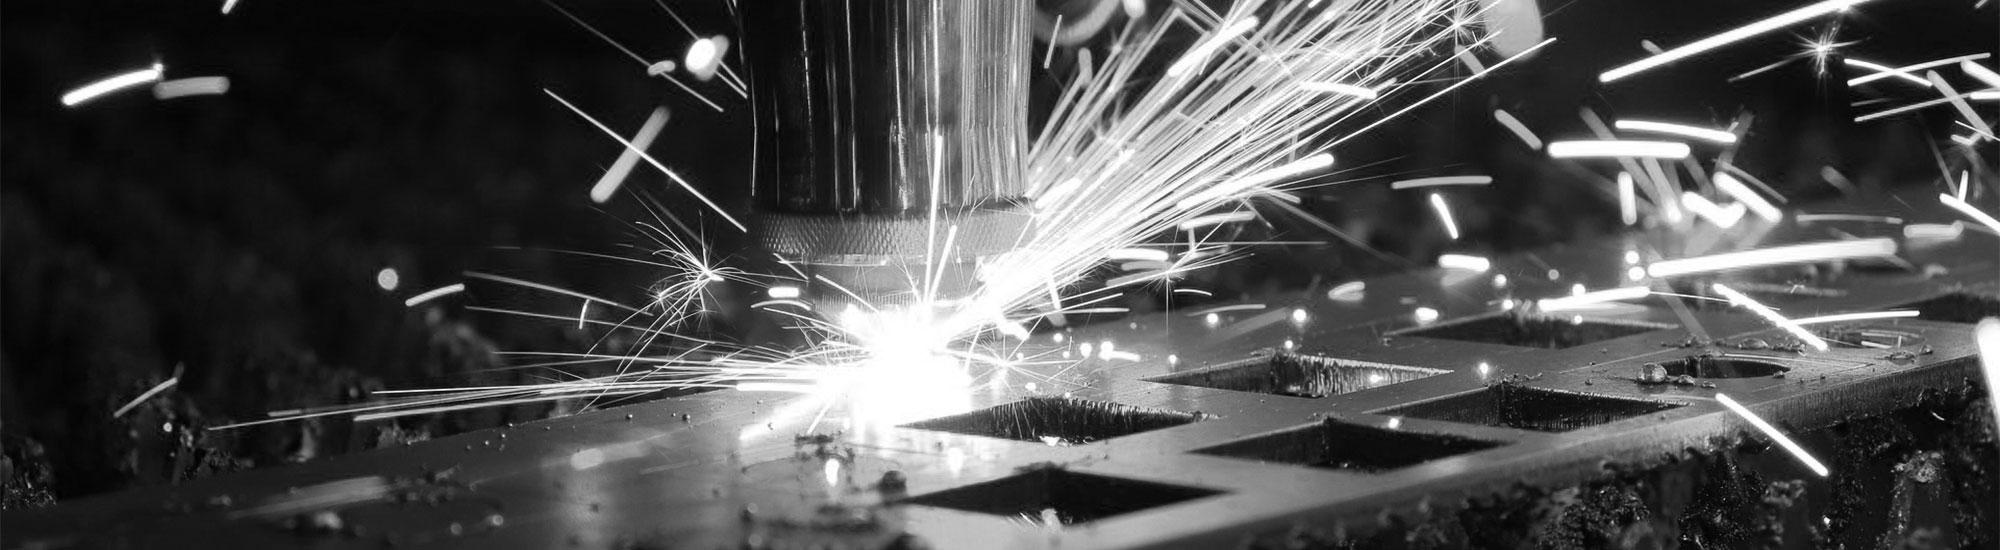 Laser cutting metal black and white